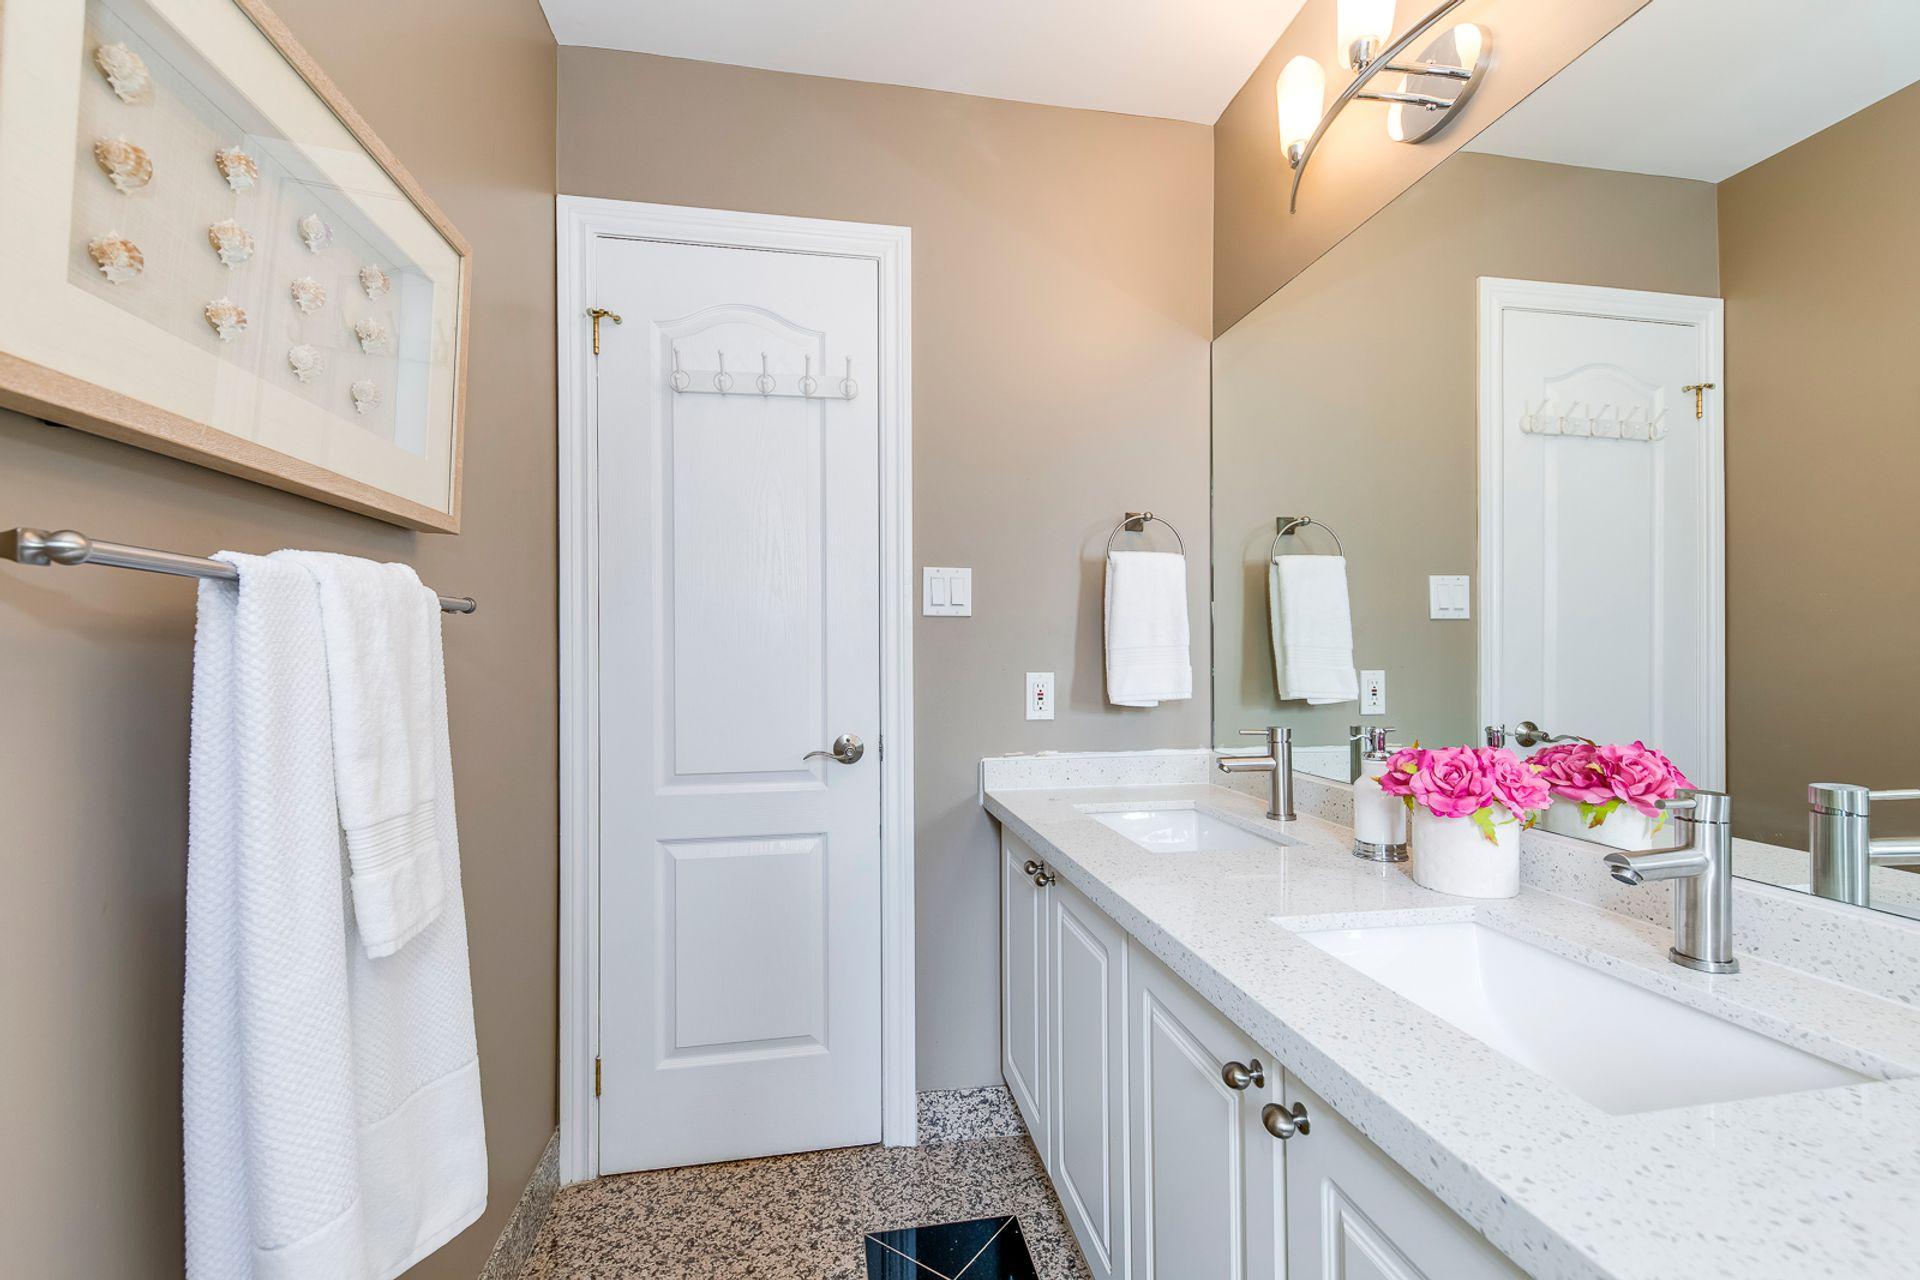 Main Bathroom - 7 - 840 Dundas St W, Mississauga - Elite3 & Team at 7 - 840 Dundas Street W, Erindale, Mississauga